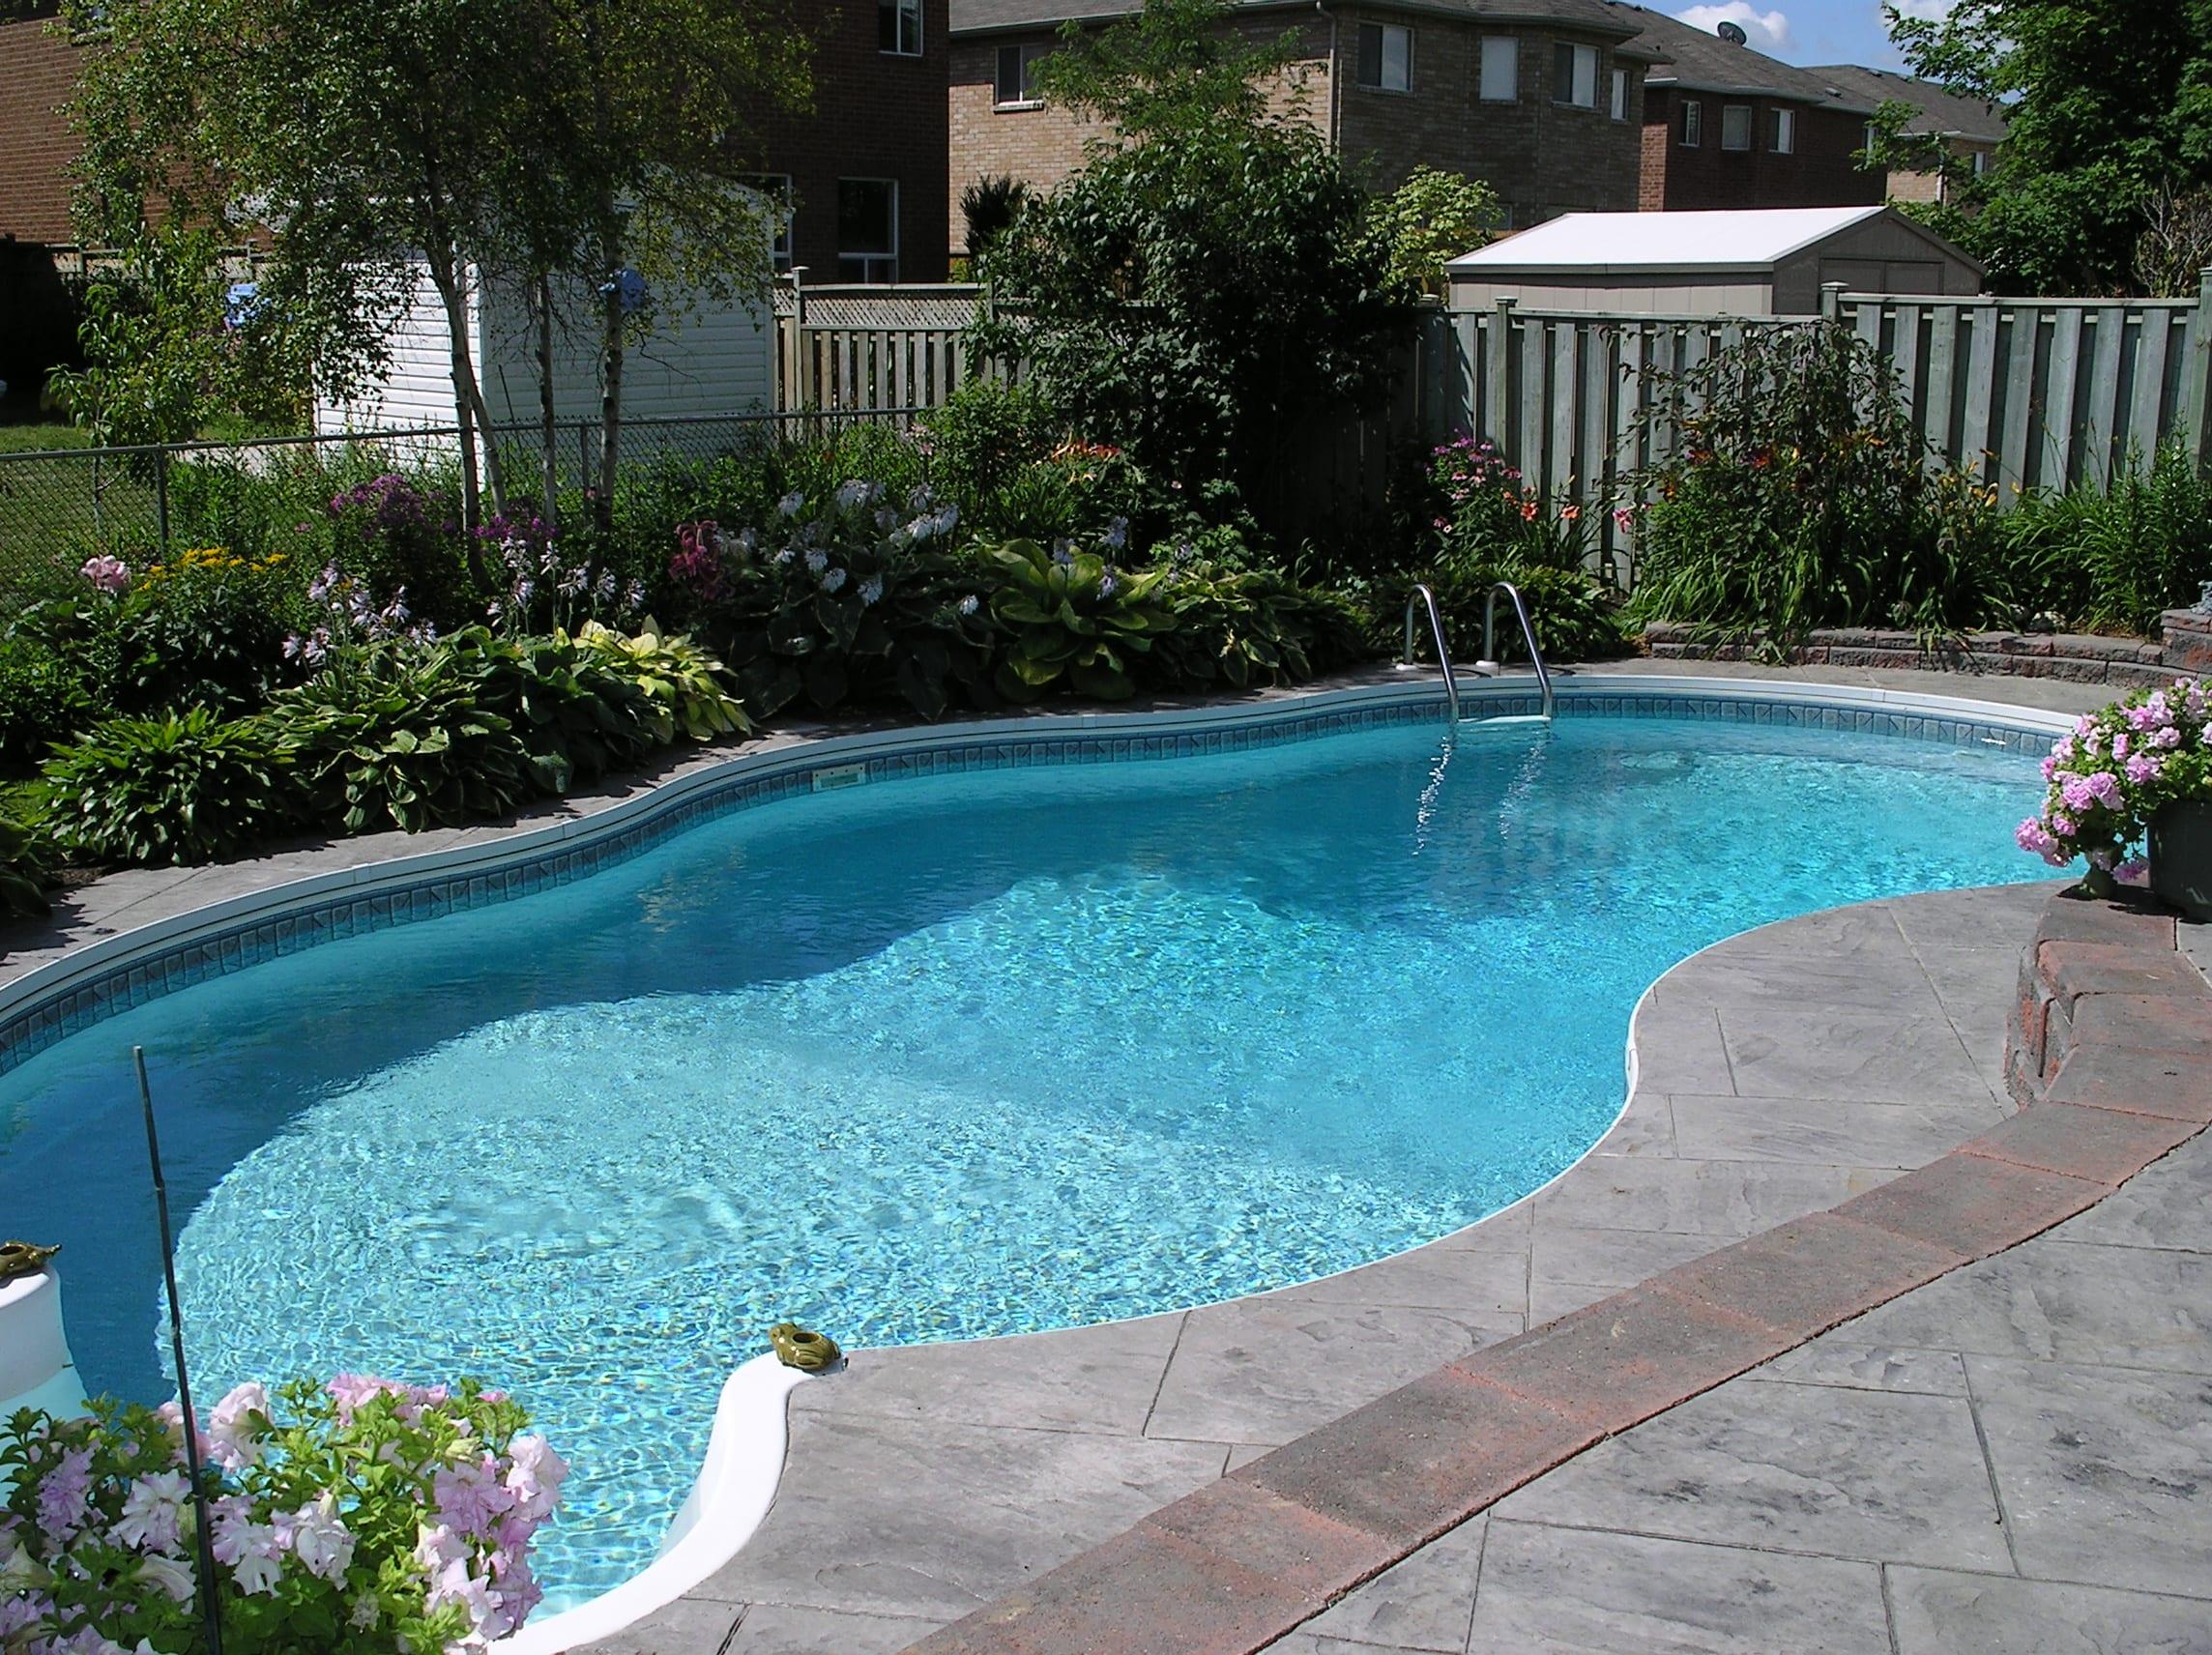 2018 pool trends